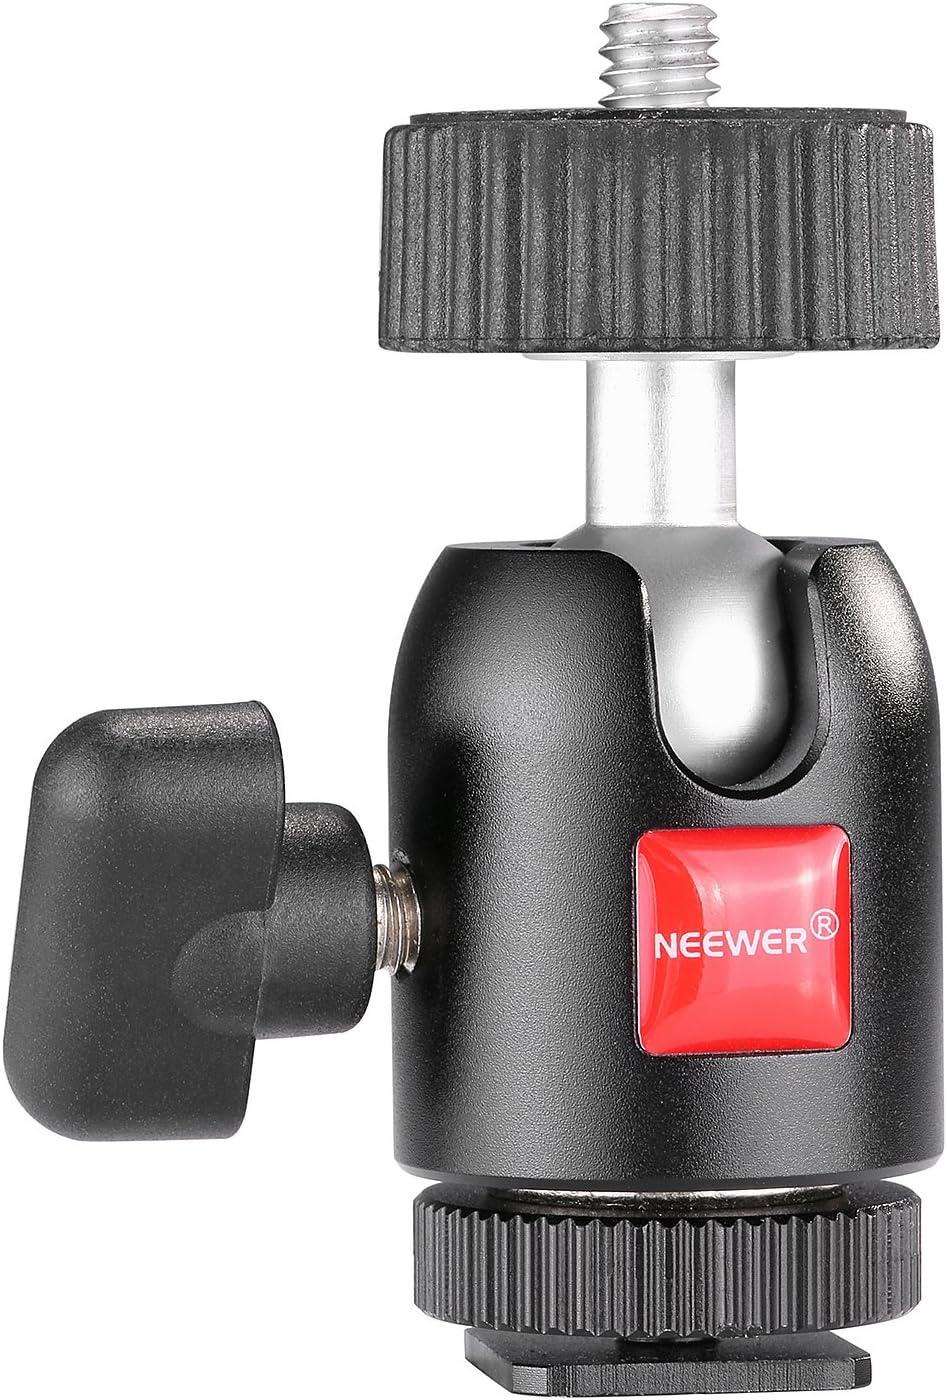 Neewer 10088100 1 4 Zoll Schraube Stativ Mini Kugel Kamera